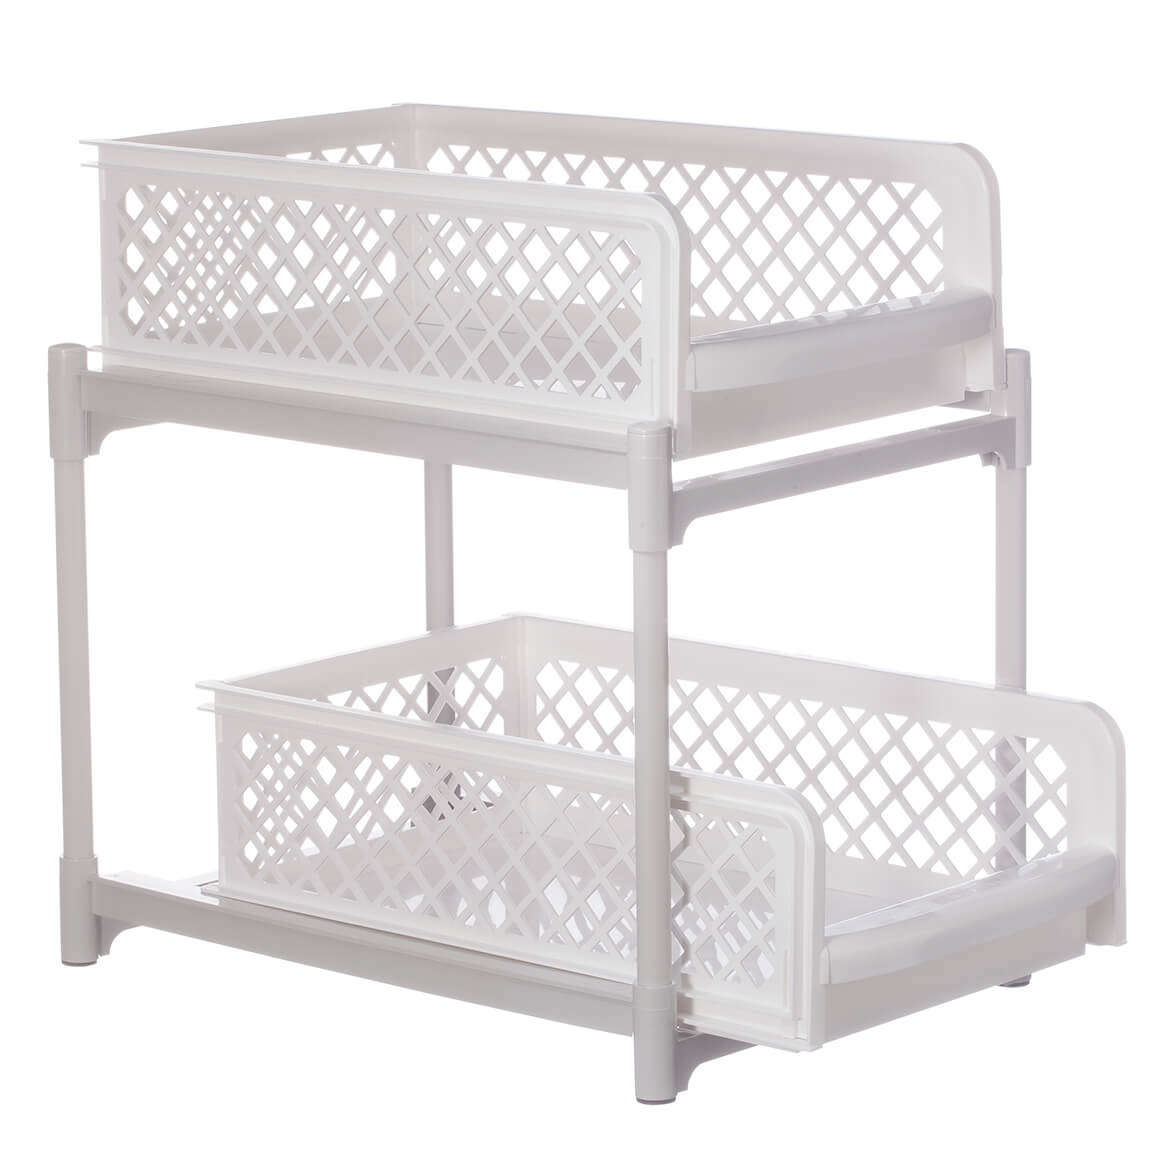 9-Inch Two-Tier Sliding Storage Drawers-361364